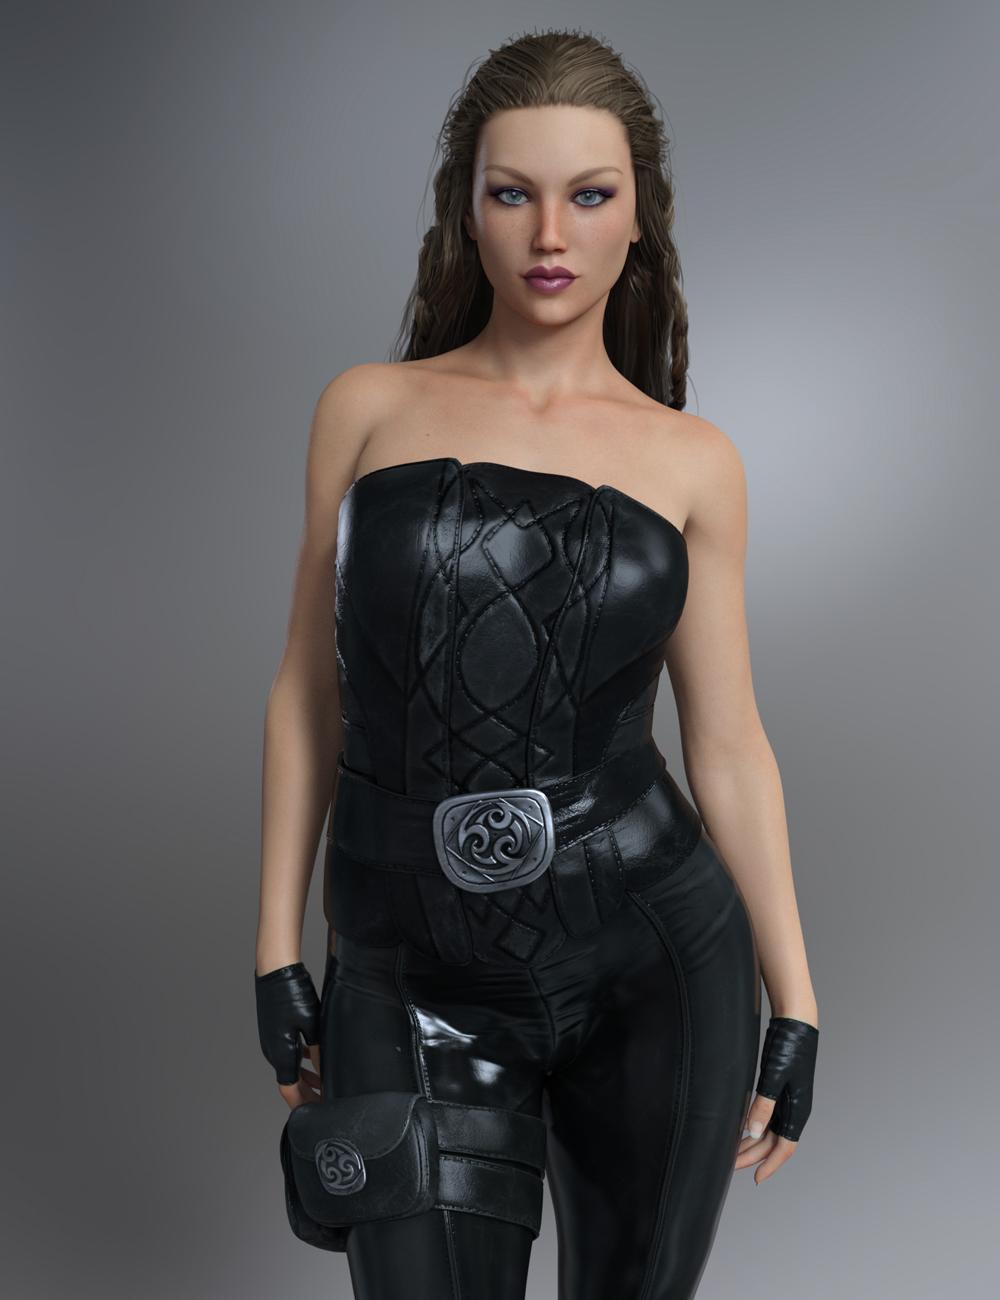 FWSA Sharah HD for Olympia 8 by: Fred Winkler ArtSabby, 3D Models by Daz 3D